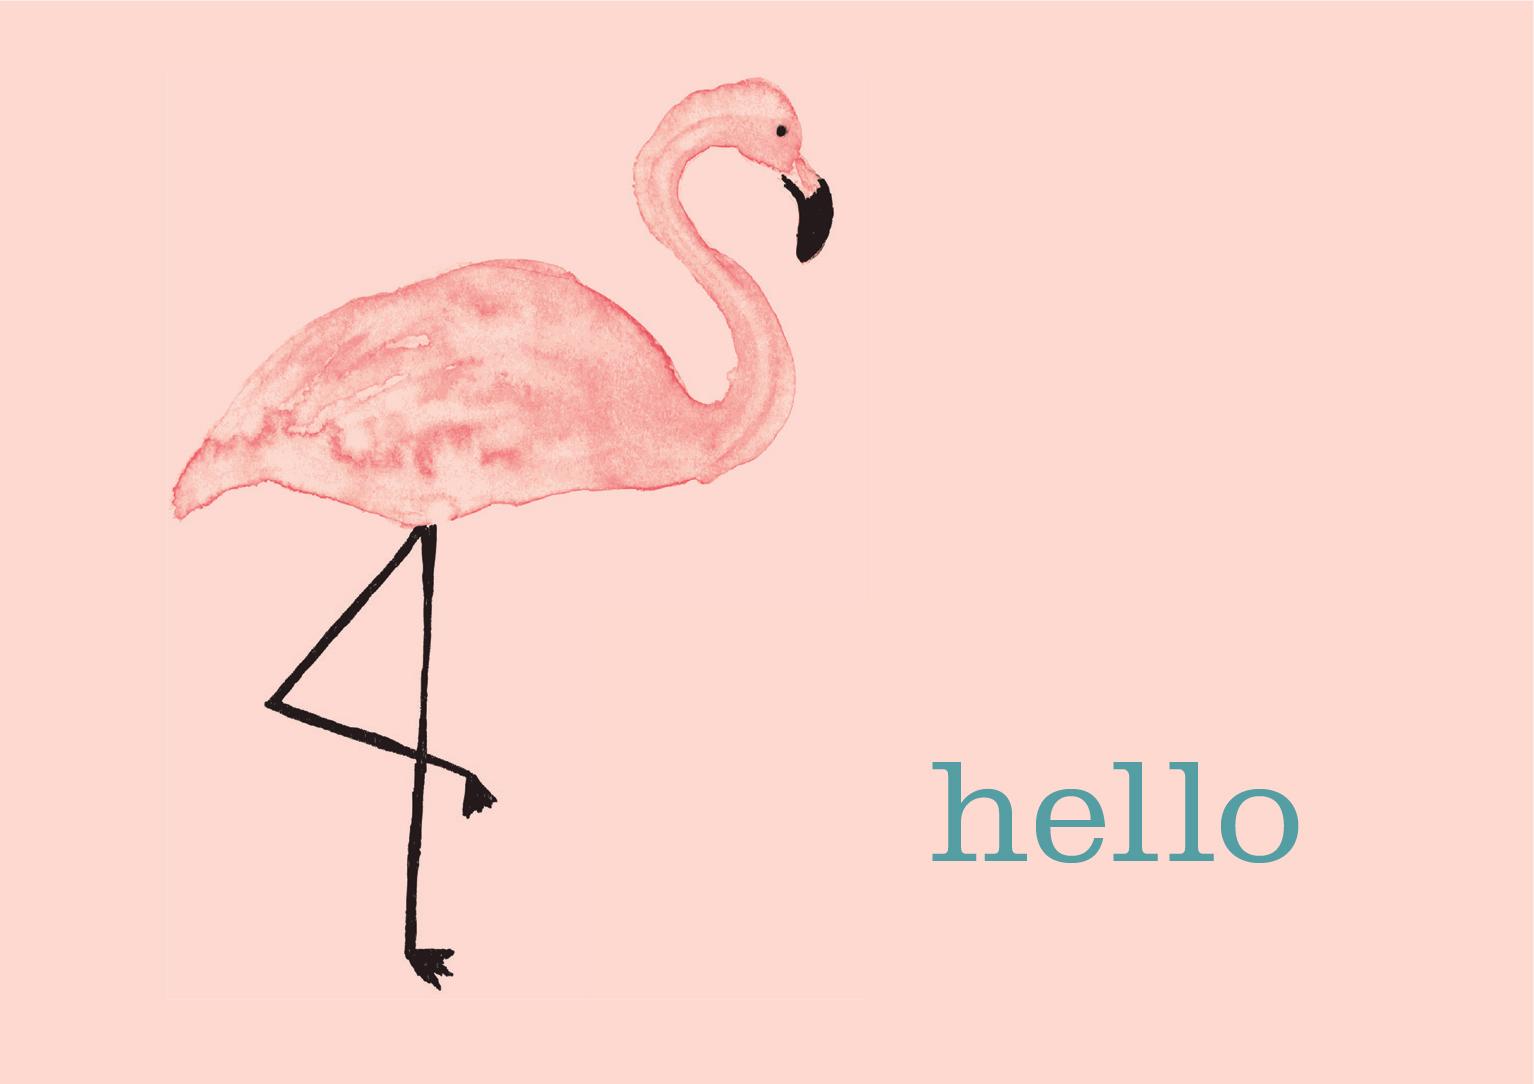 Hello_Flamingo.jpg